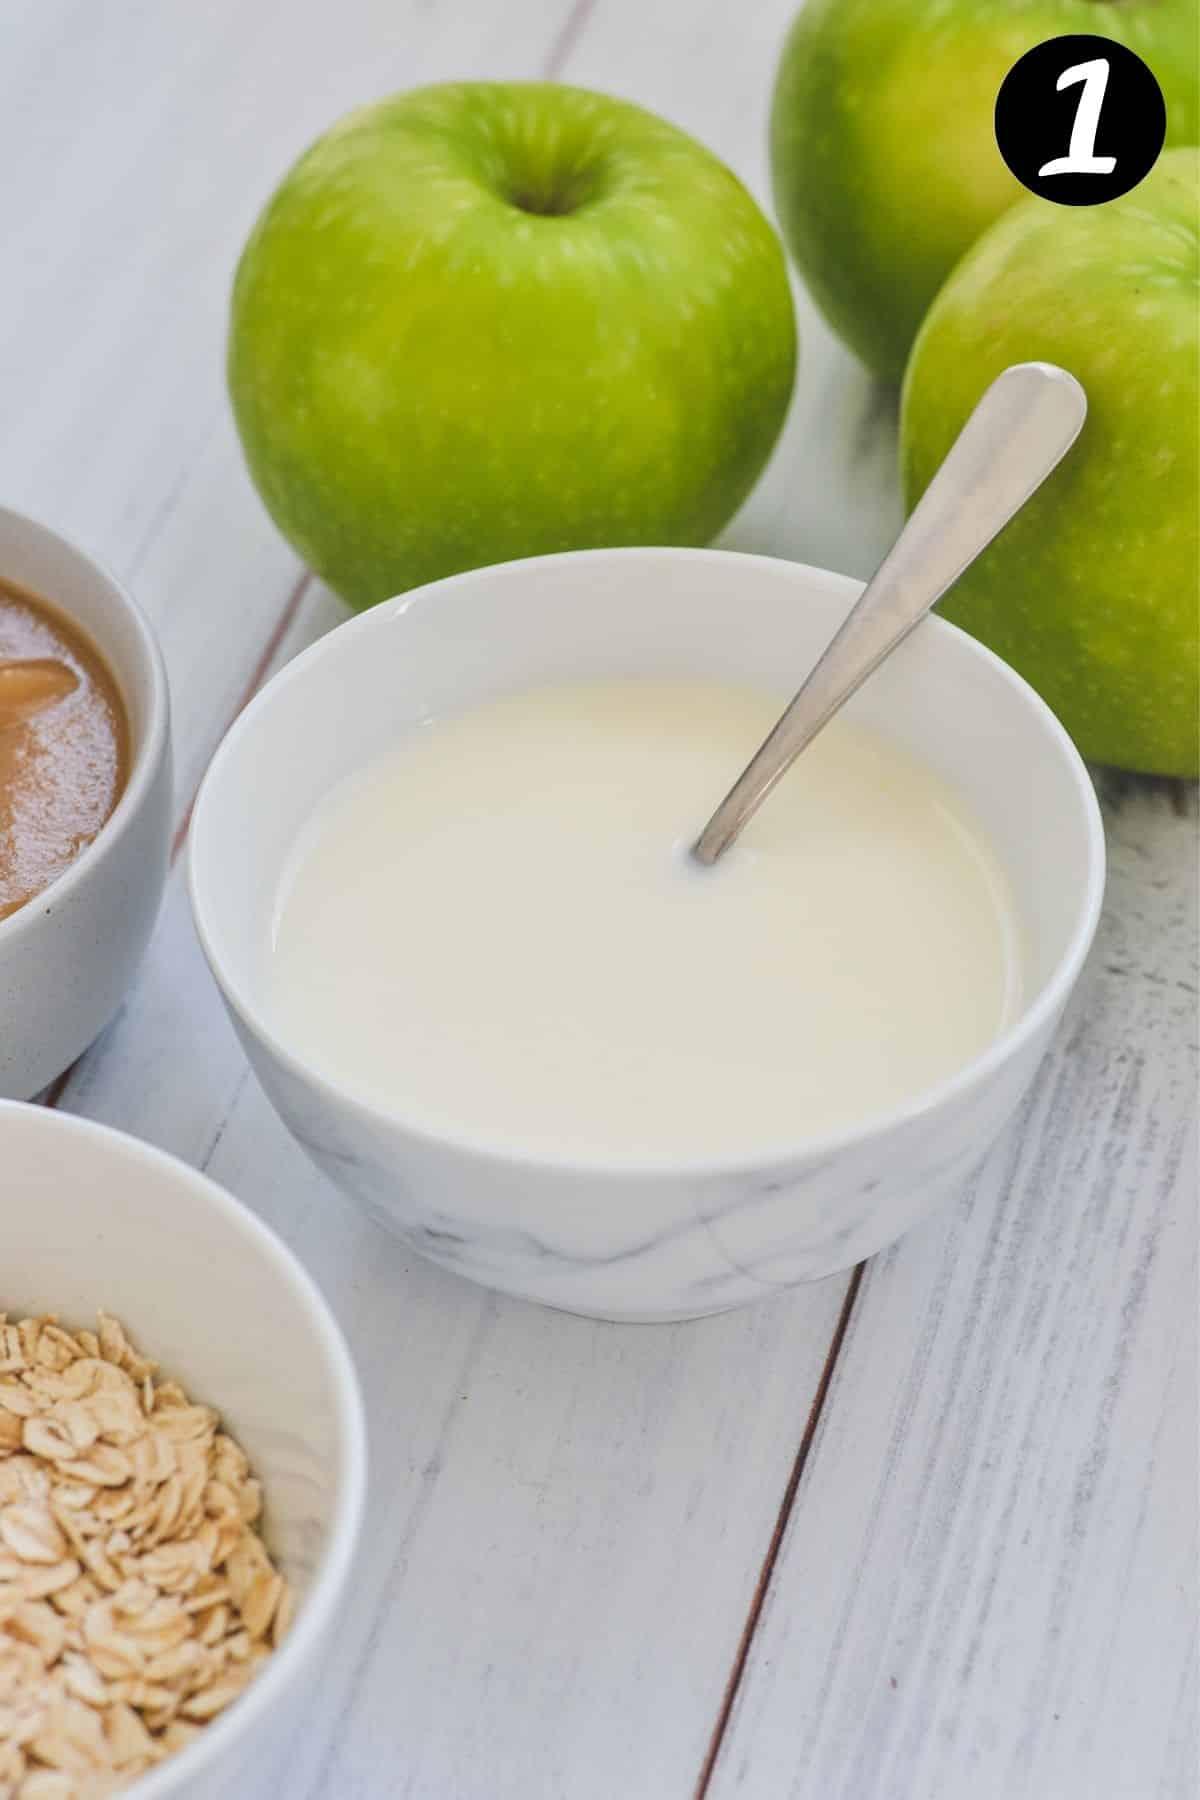 milk in a white bowl